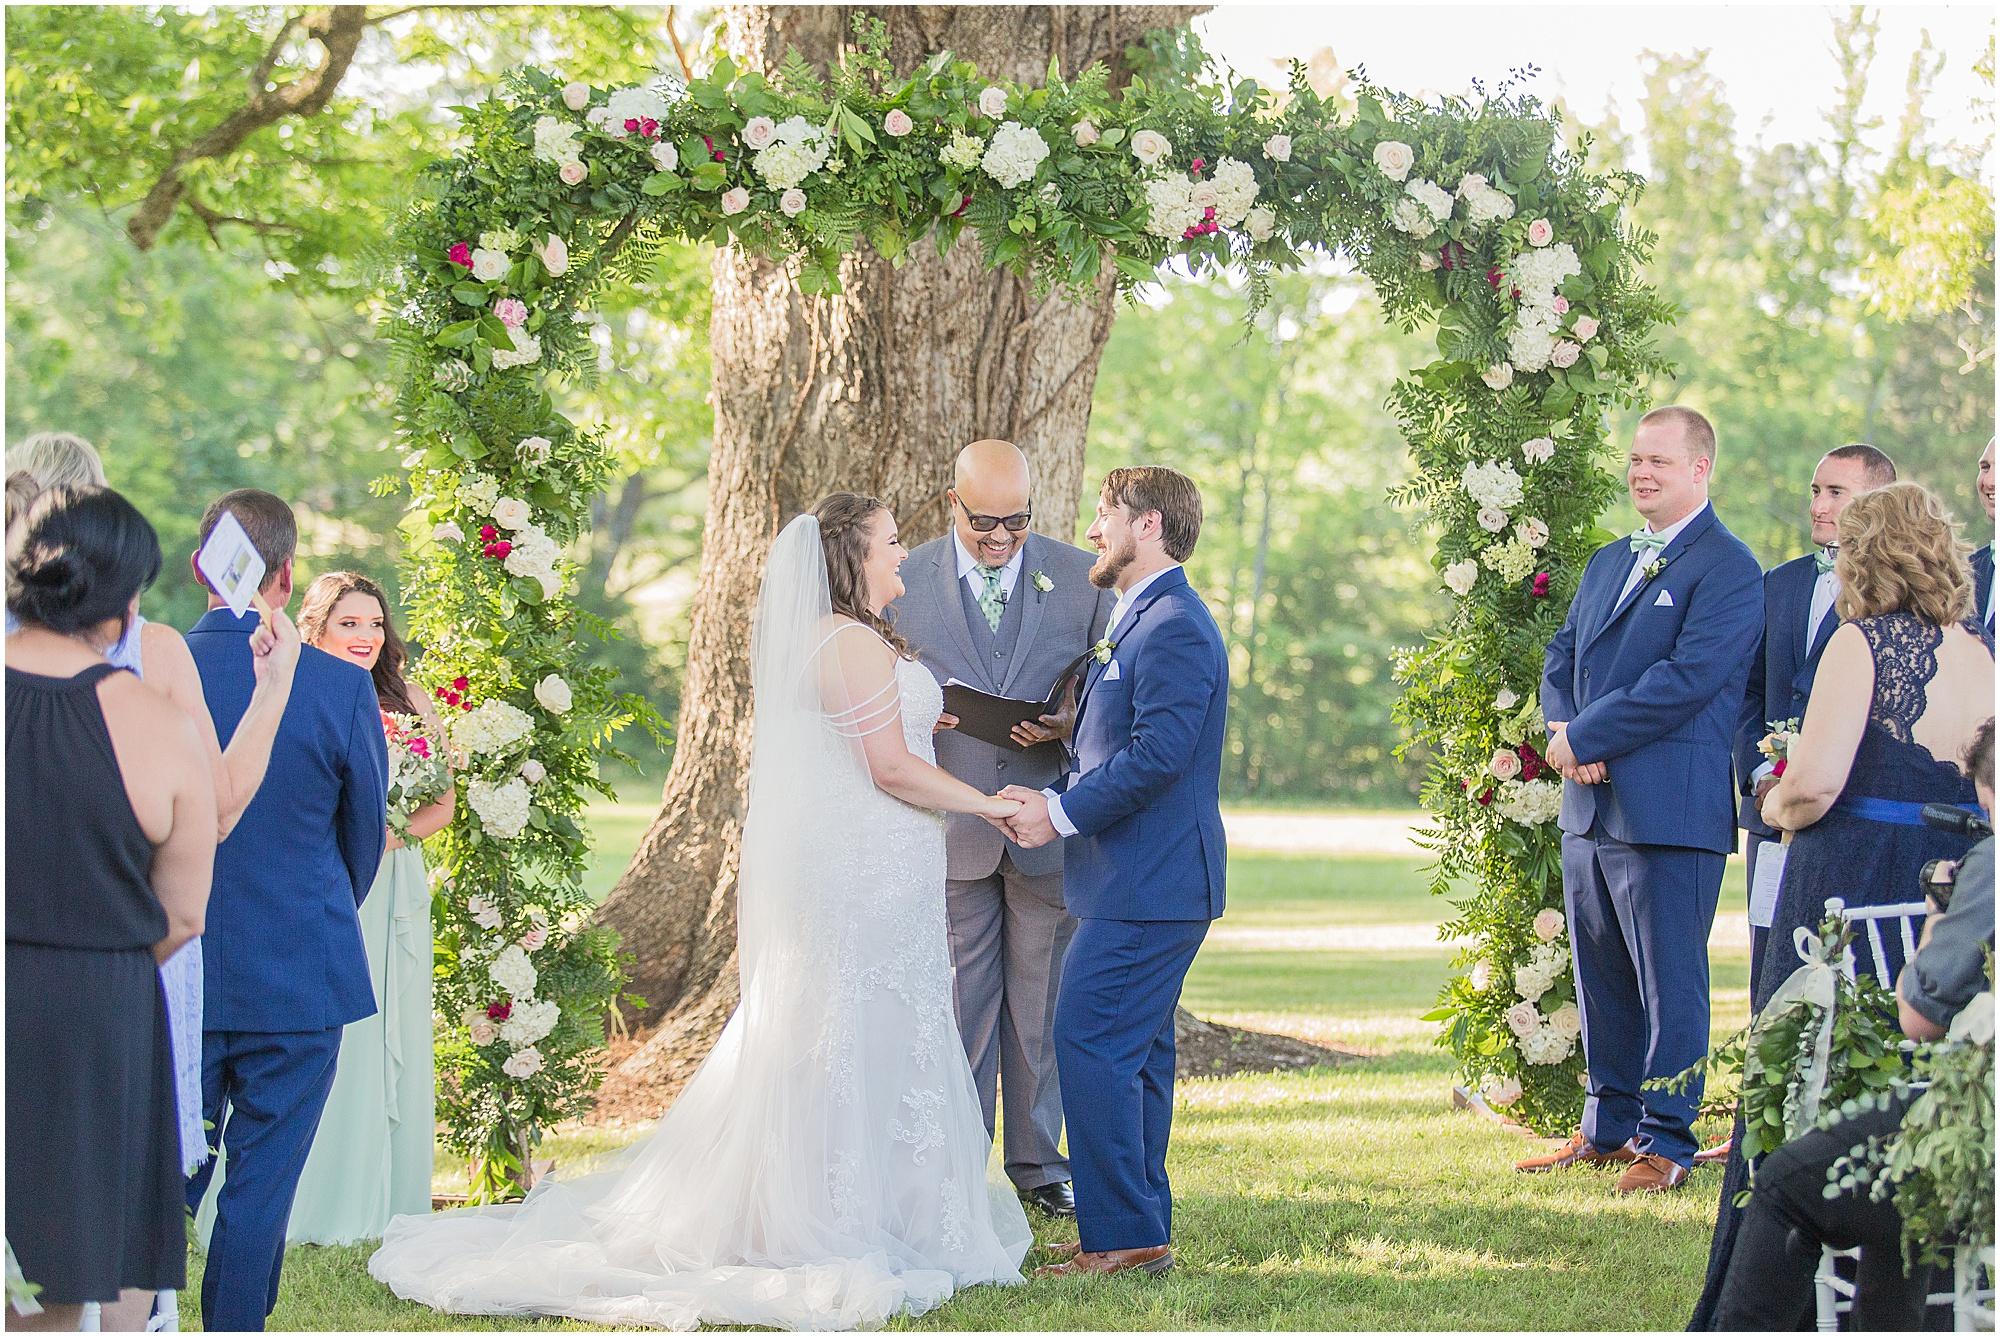 starkville-mississippi-wedding-page-place-dodson-farms_0058.jpg